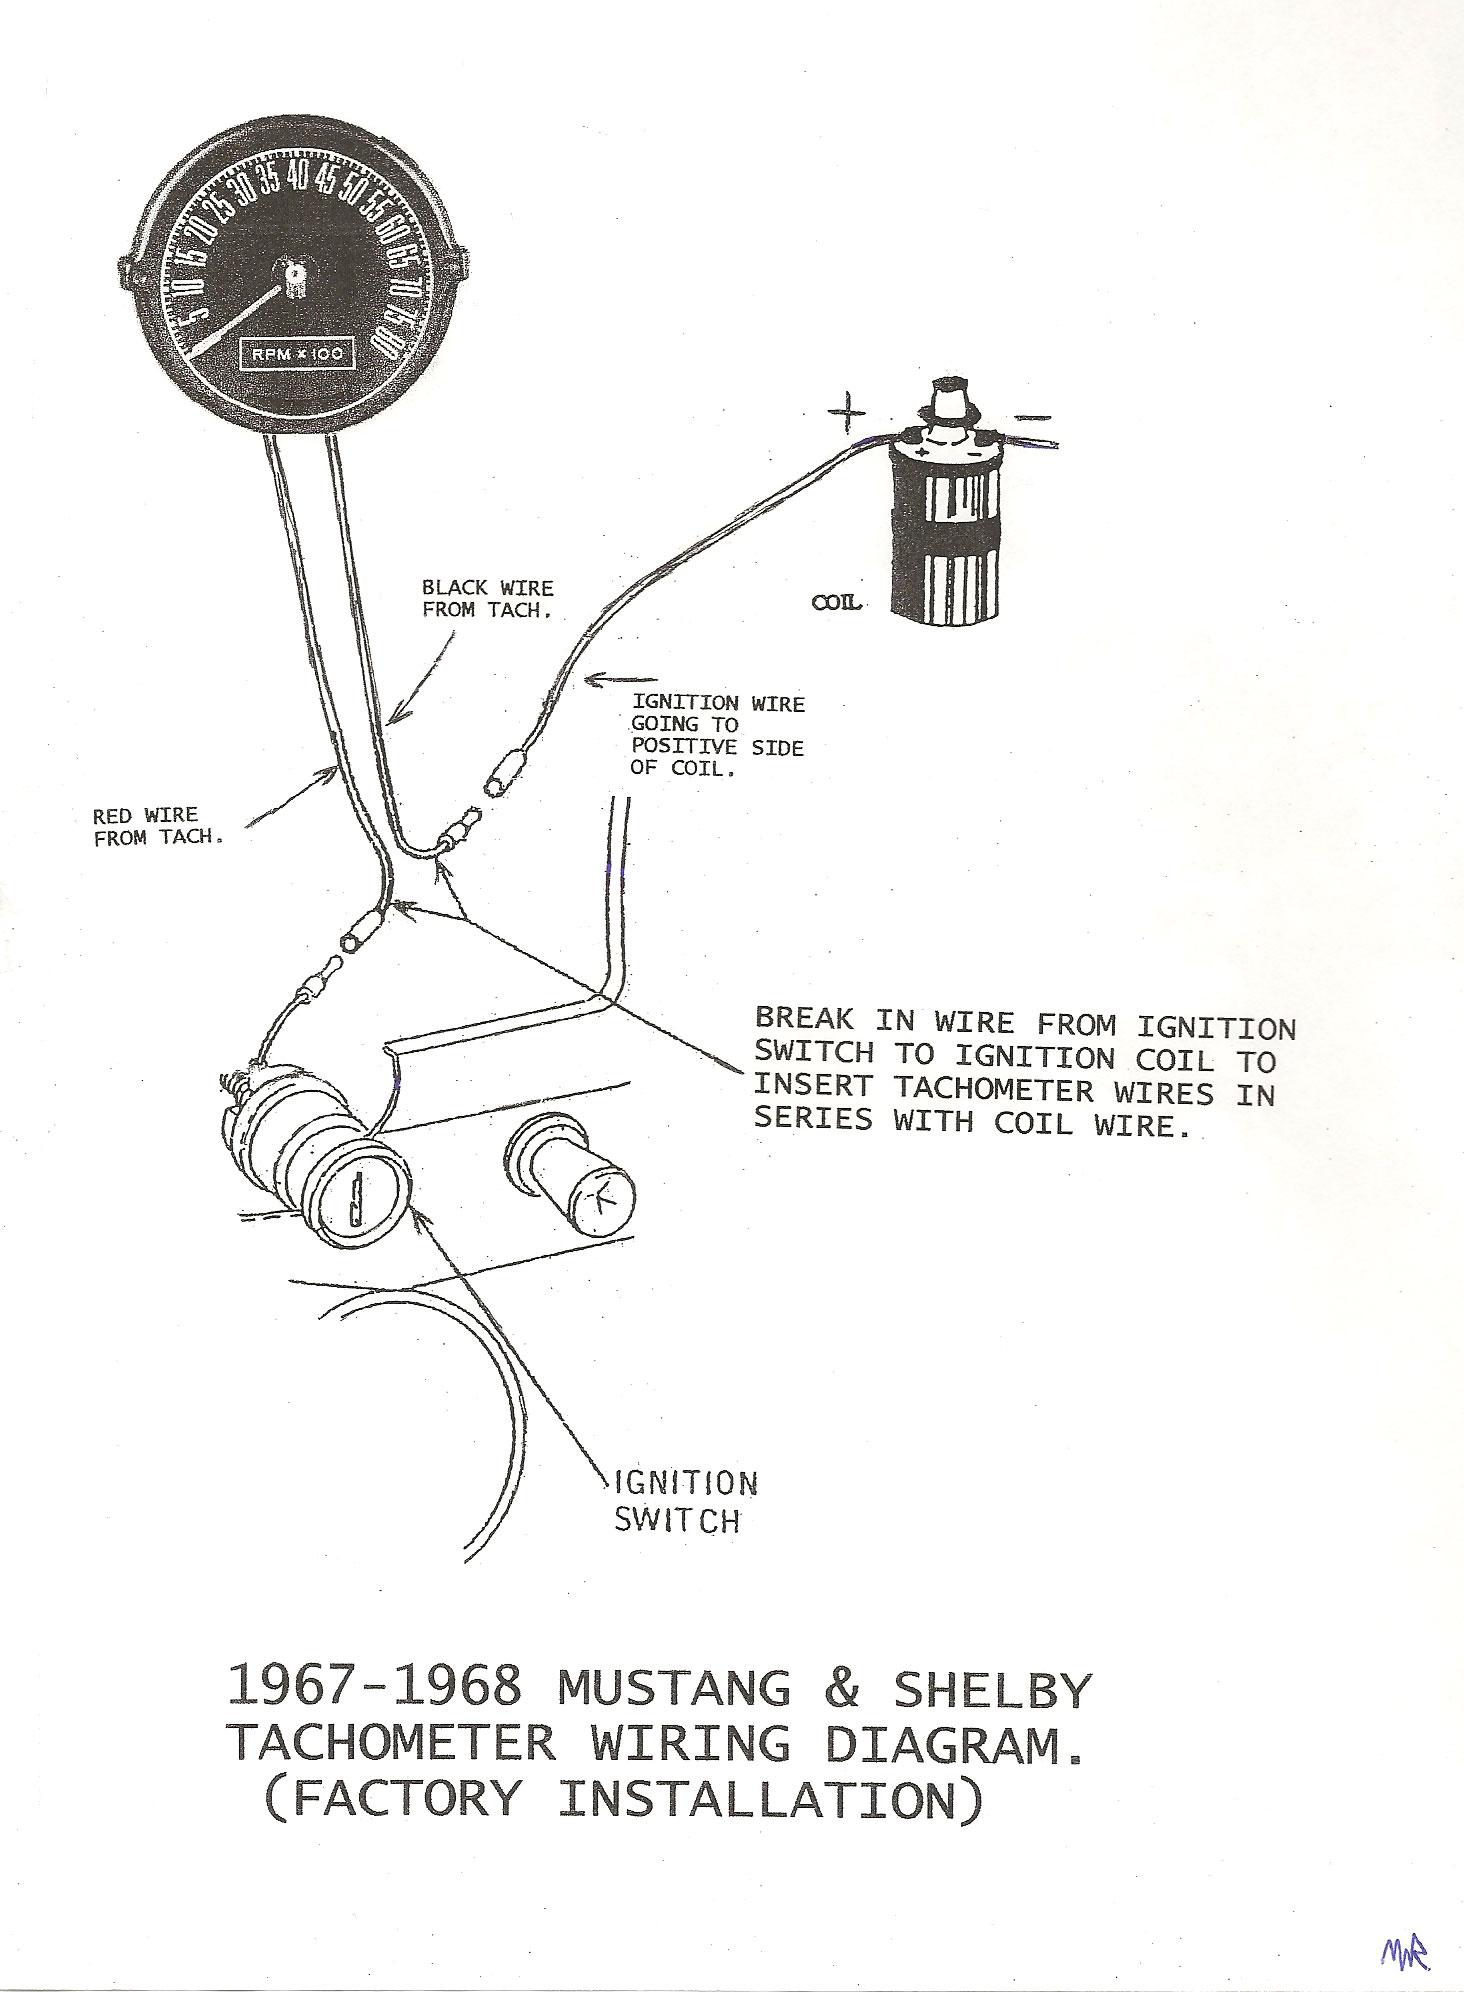 1968 mustang wiring diagram for outdoor motion sensor light tech info